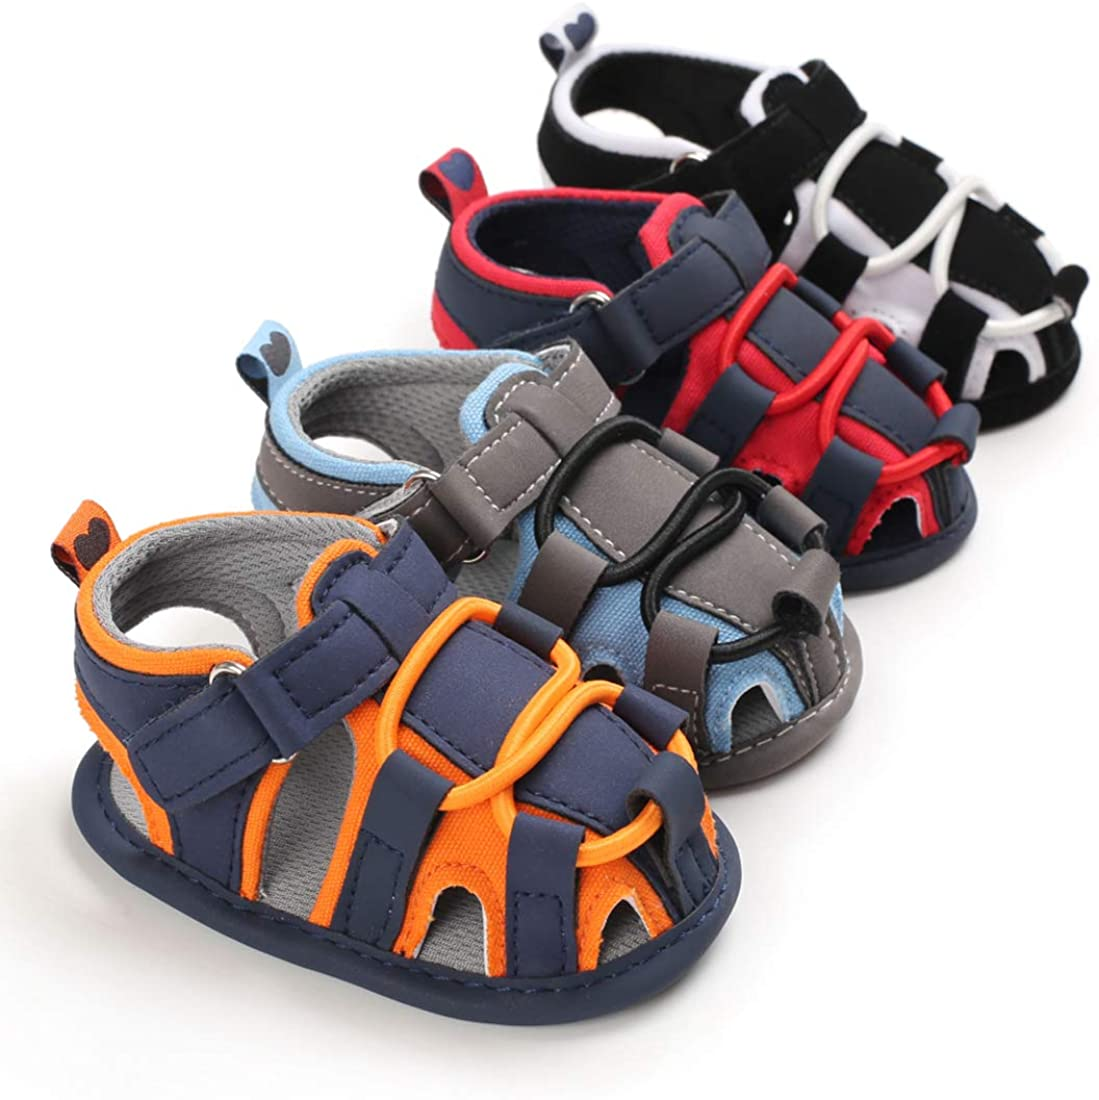 Infant Baby Boys Girls Summer Shoes Athletic Beach Sandal Casual Breathable Anti-Slip Soft Sole Newborn Prewalker First Crib Shoes